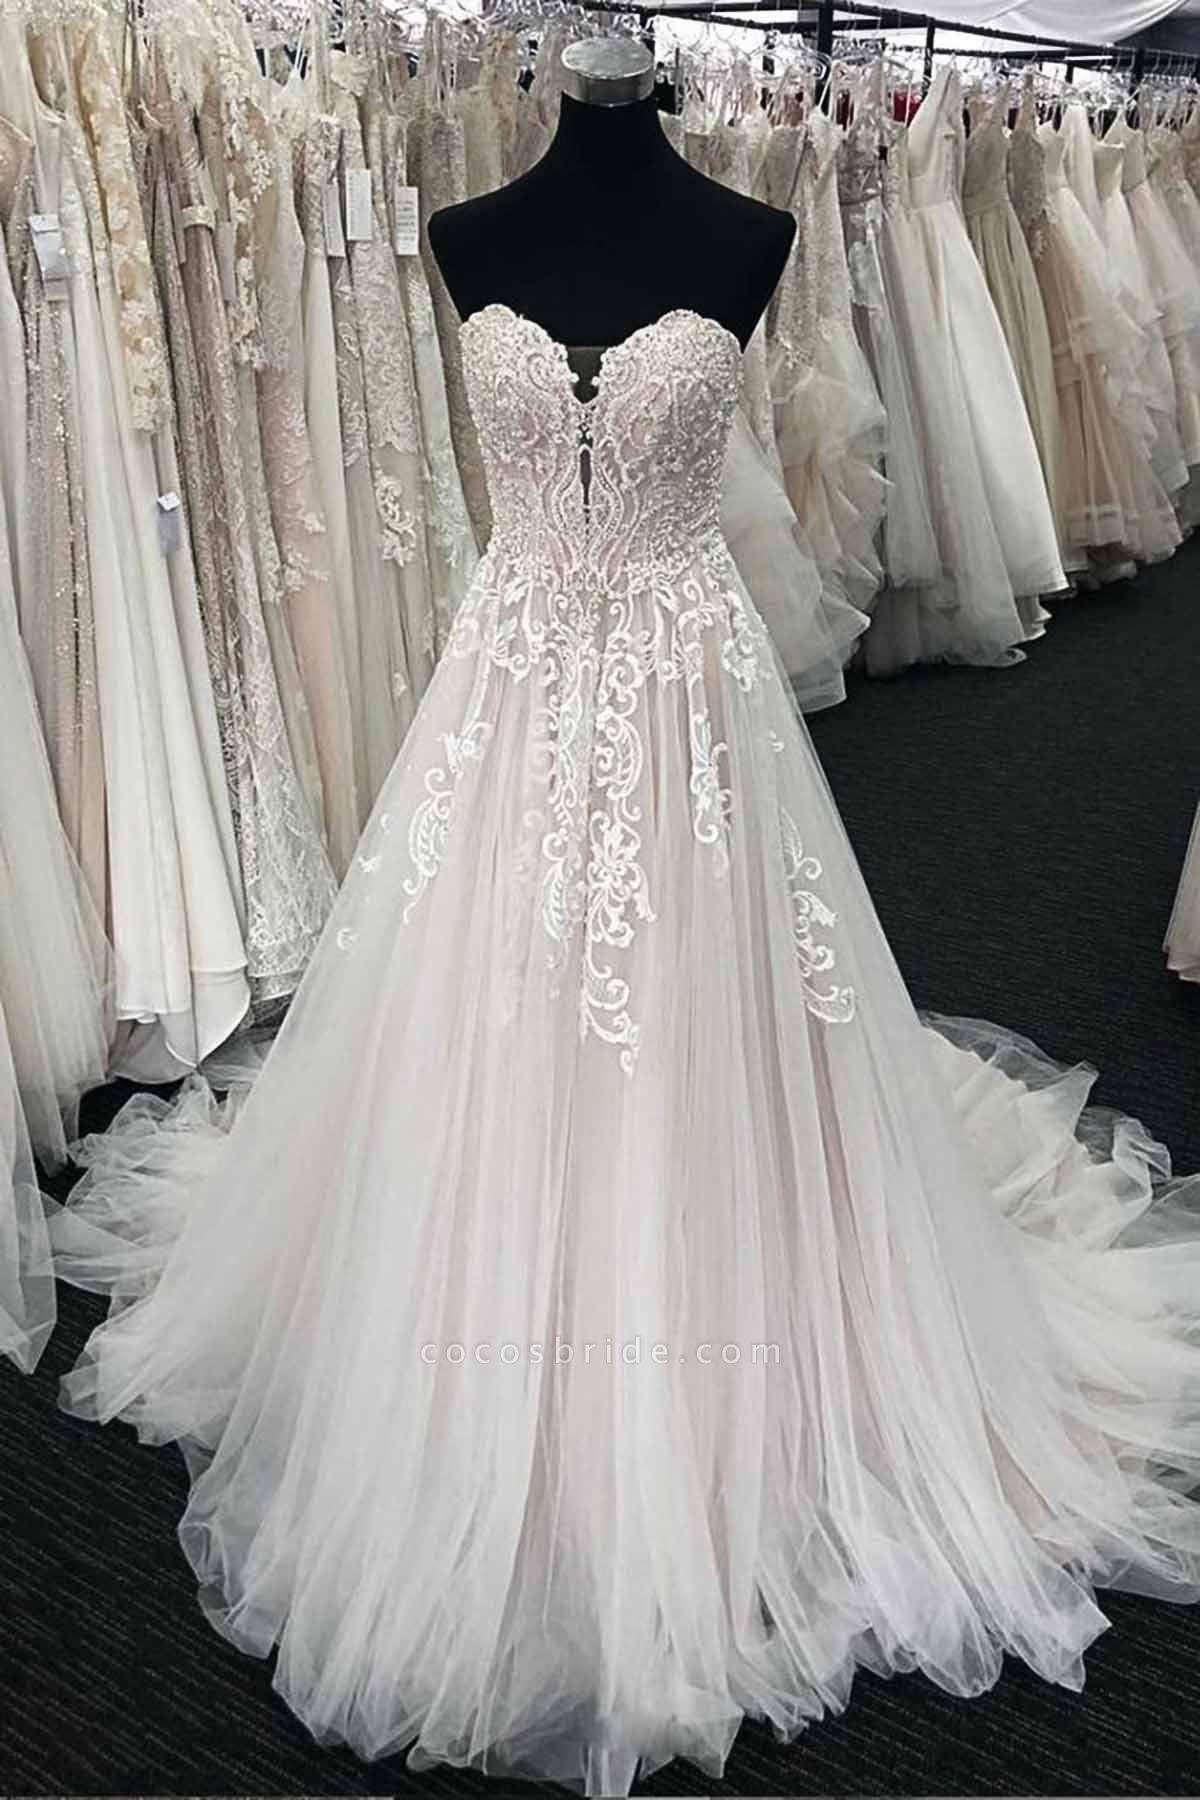 Unique White Lace Sweetheart Neck Long  White Wedding Dress